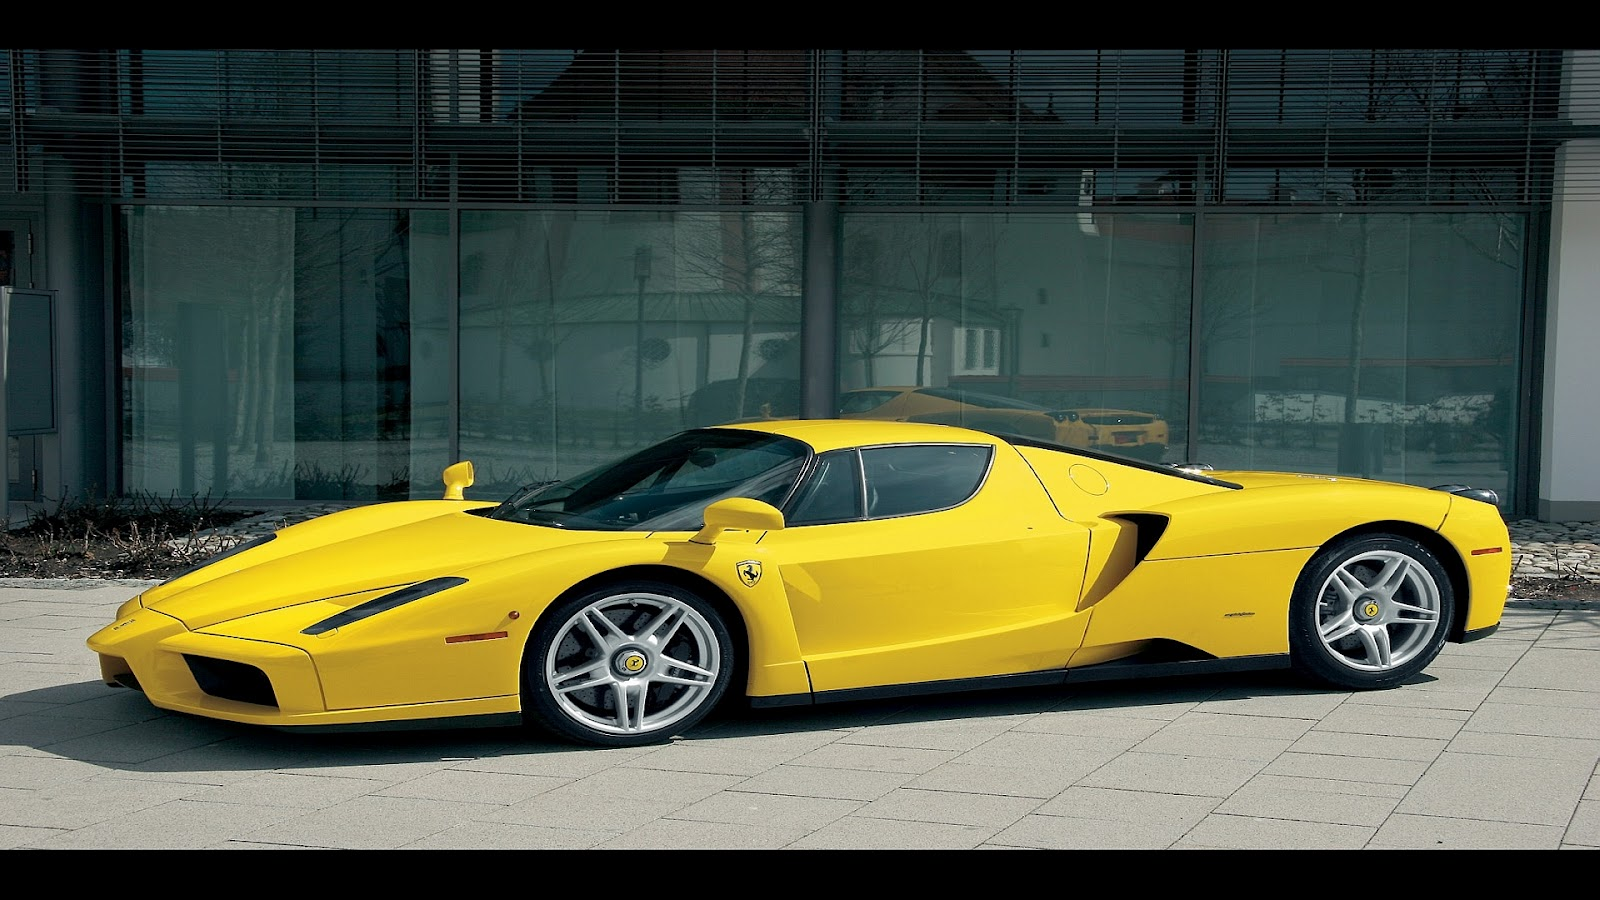 Ferrari Sports Cars | World of Top Autos